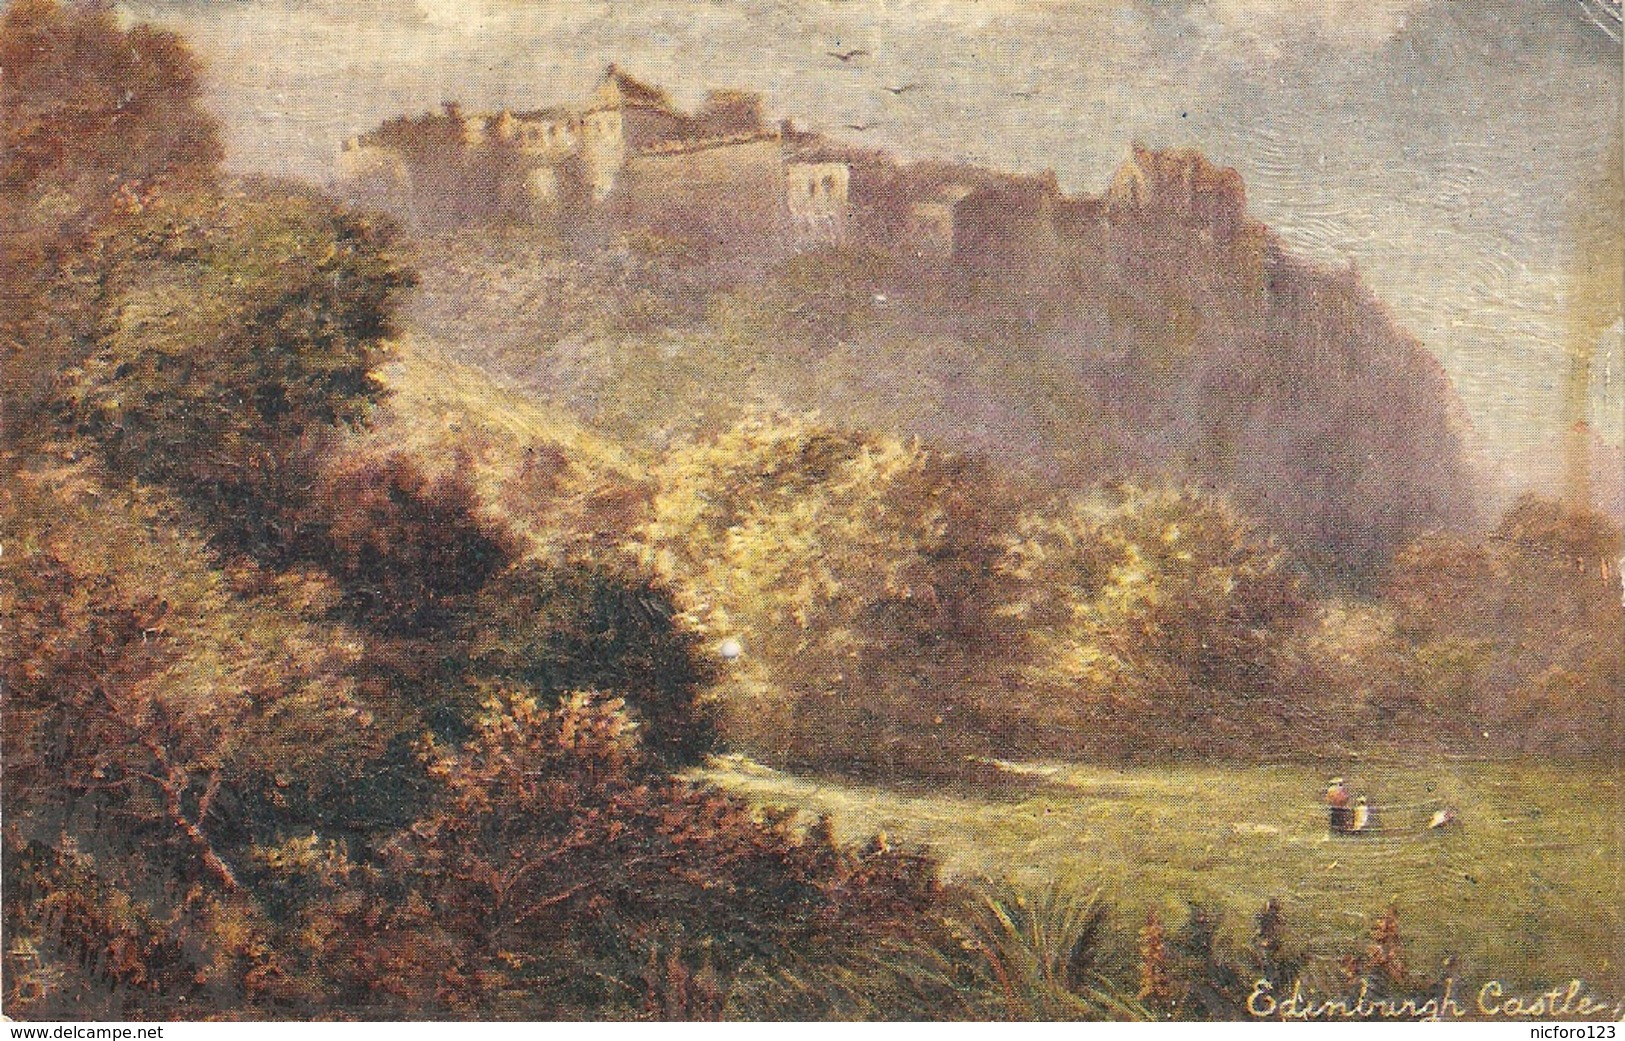 """F.W. Hayes.Edinburghr Castle"" Tuck Oilette Scottish Castles Ser. PC # 7181 - Tuck, Raphael"